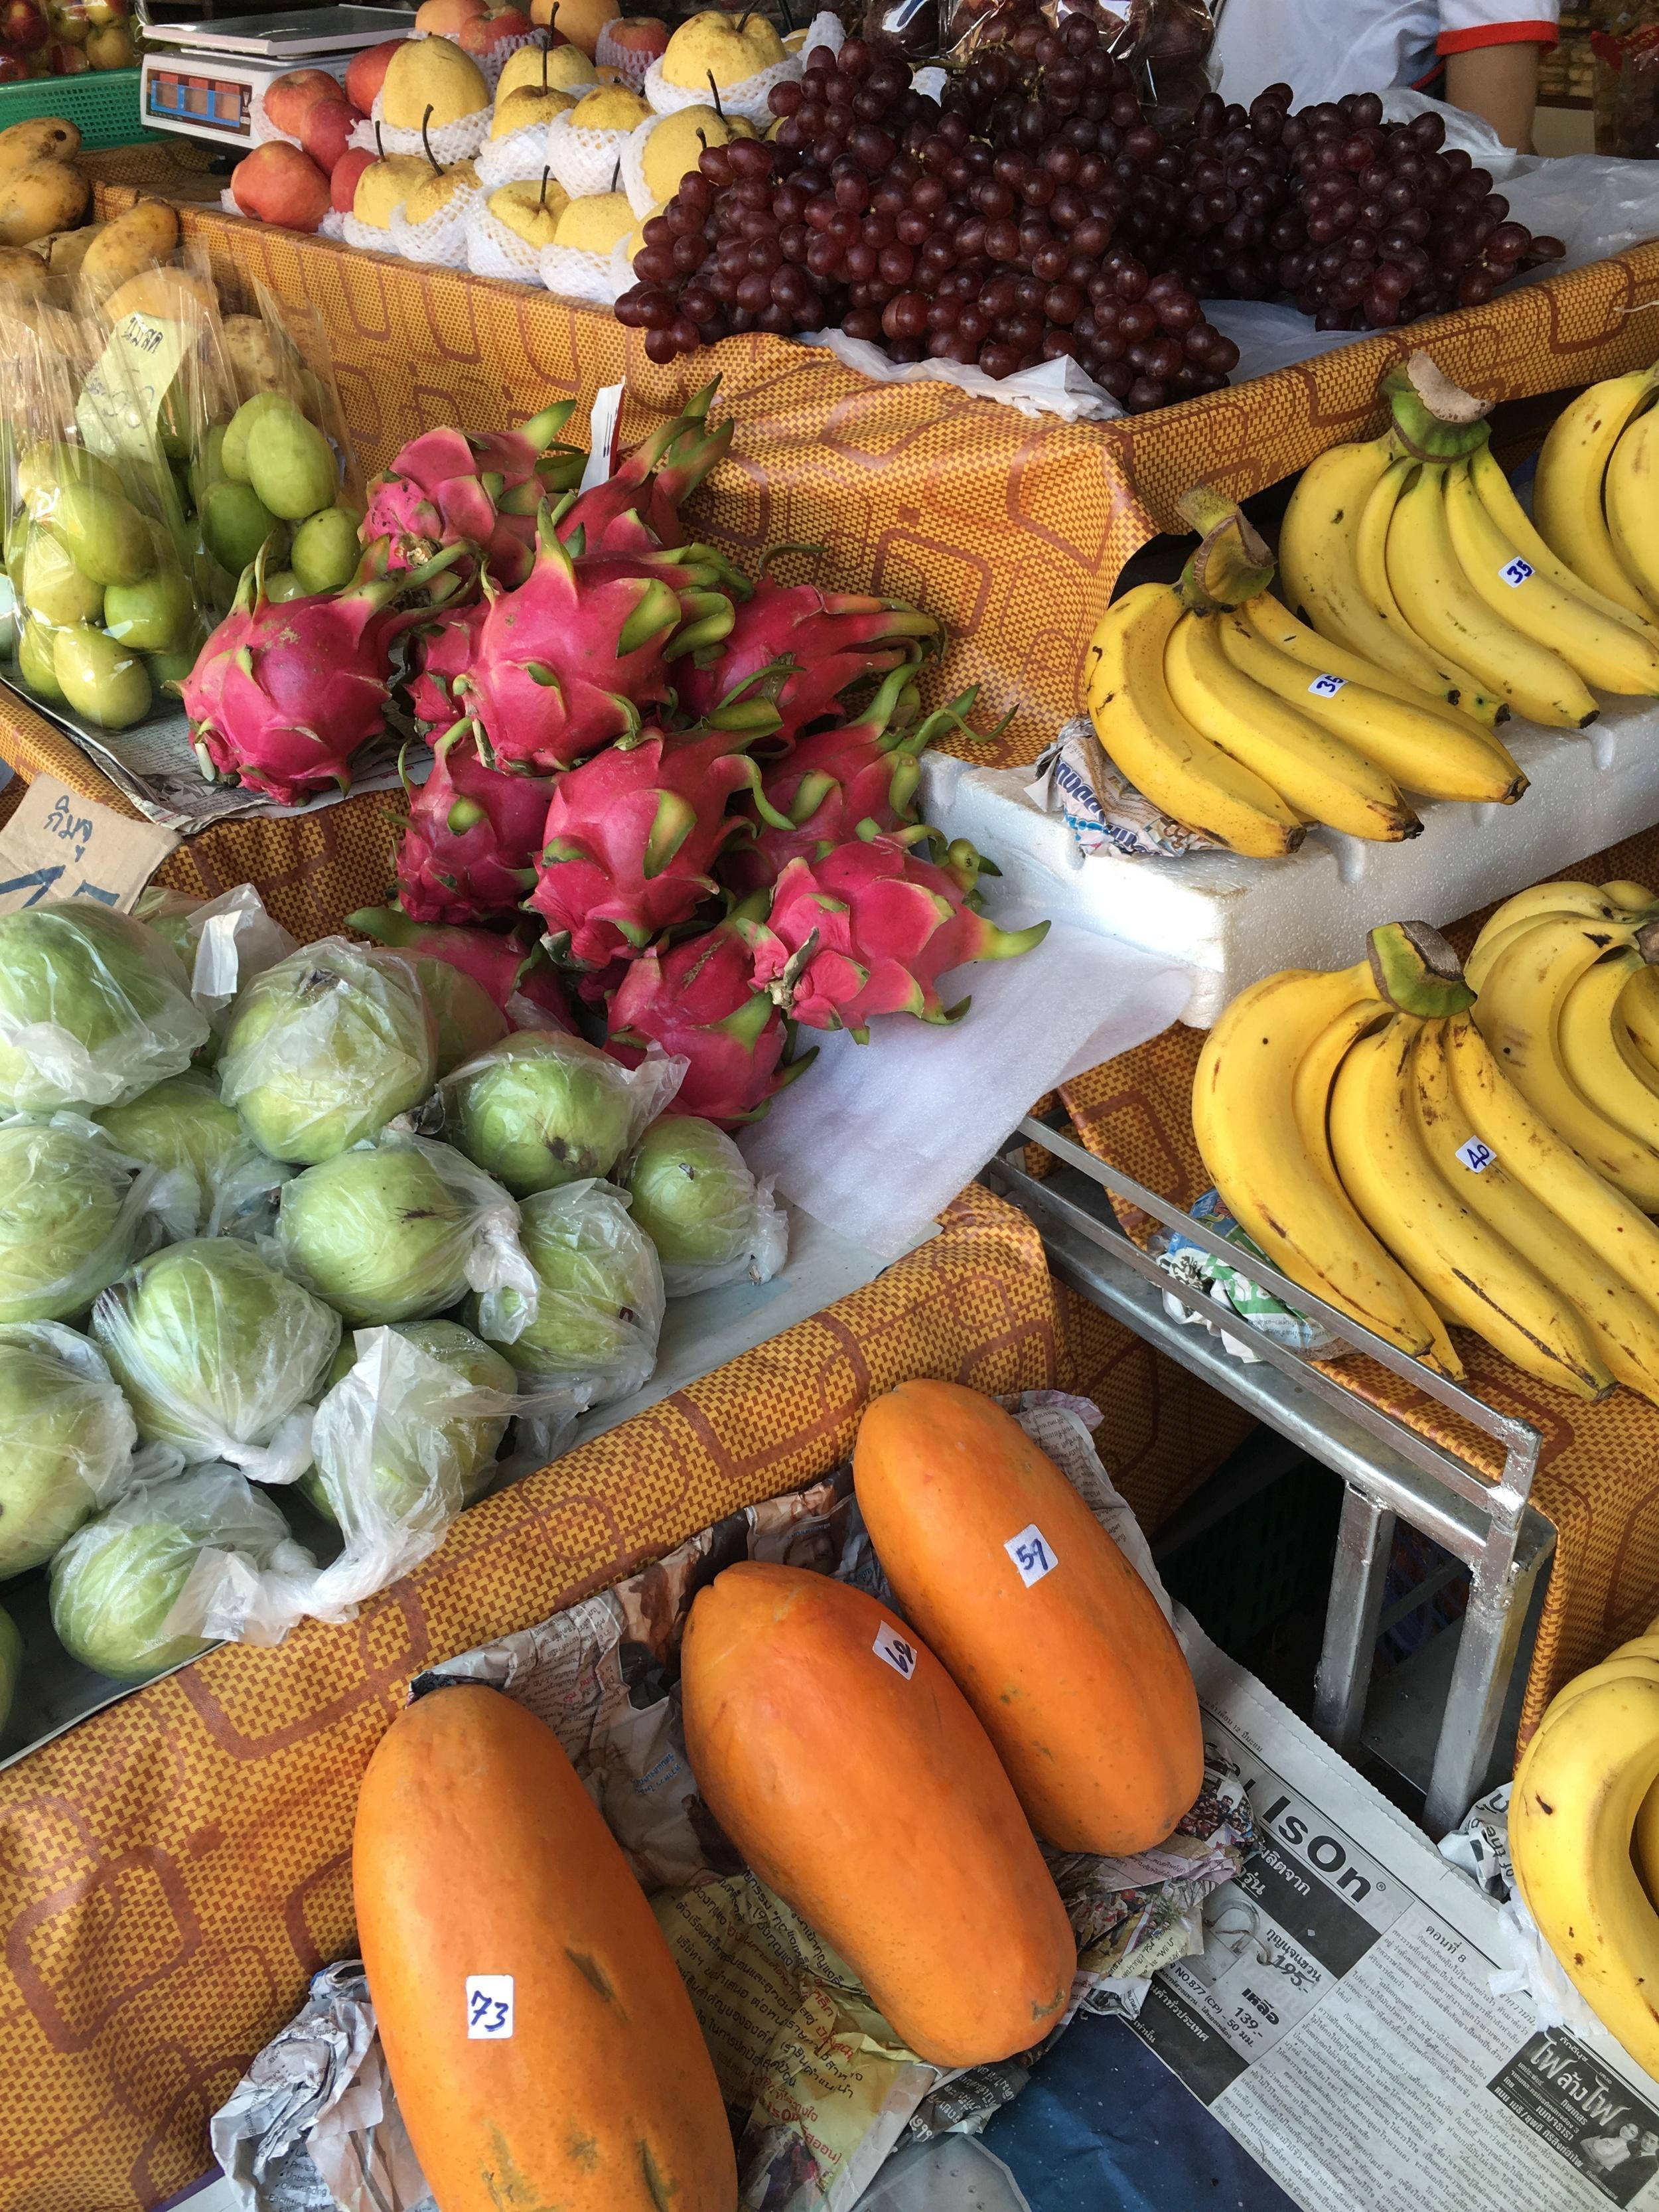 Dragonfruit and papaya